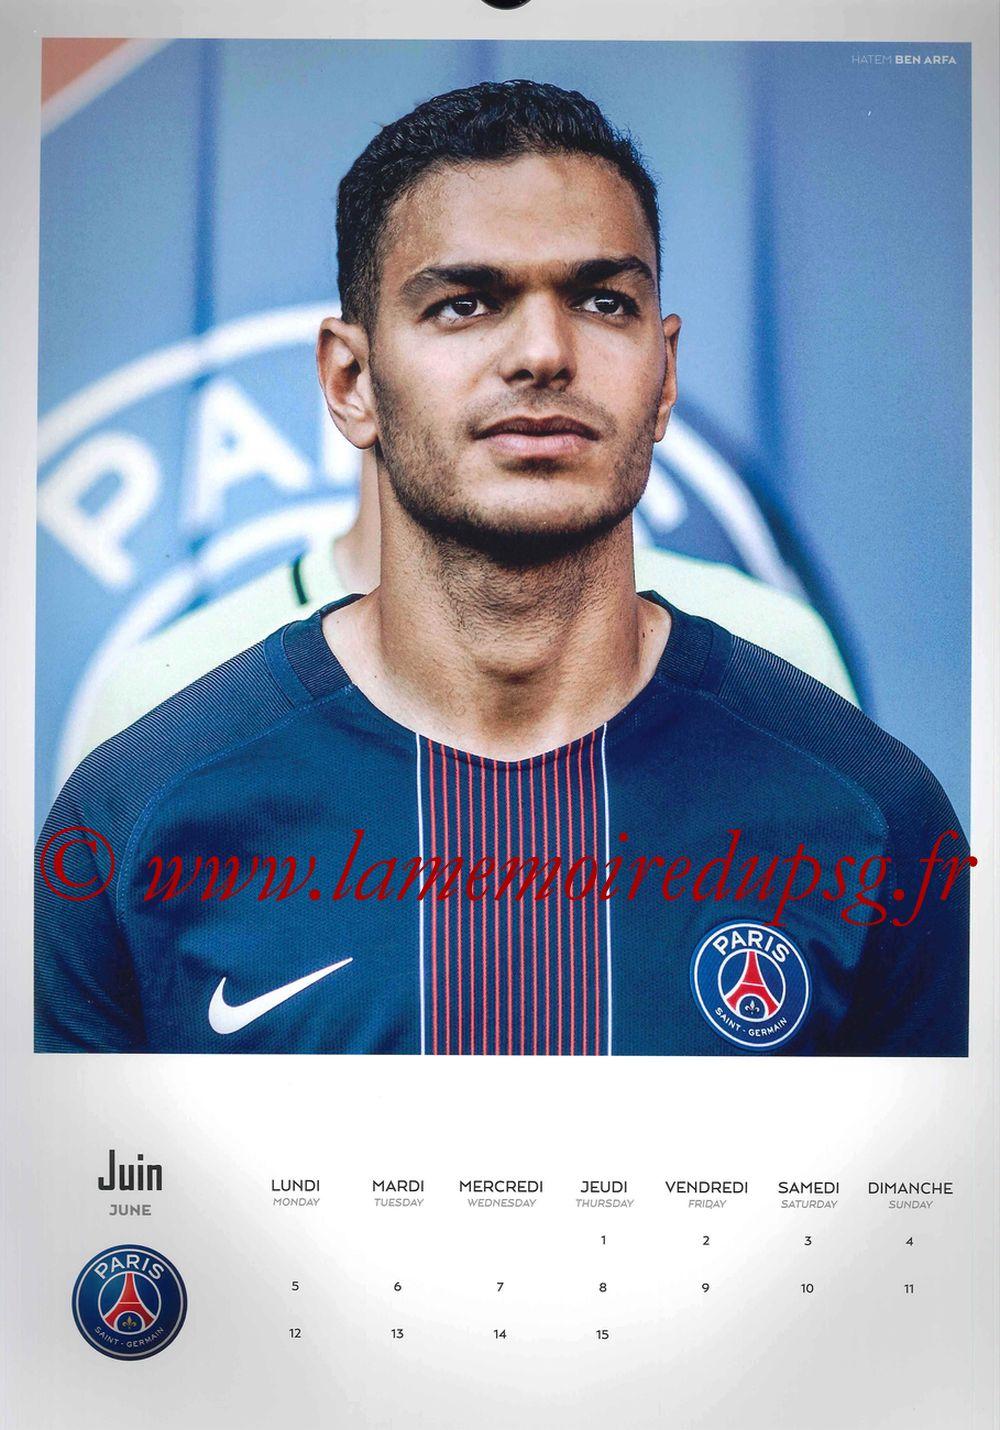 Calendrier PSG 2017 - Page 11 - Hatem BEN ARFA